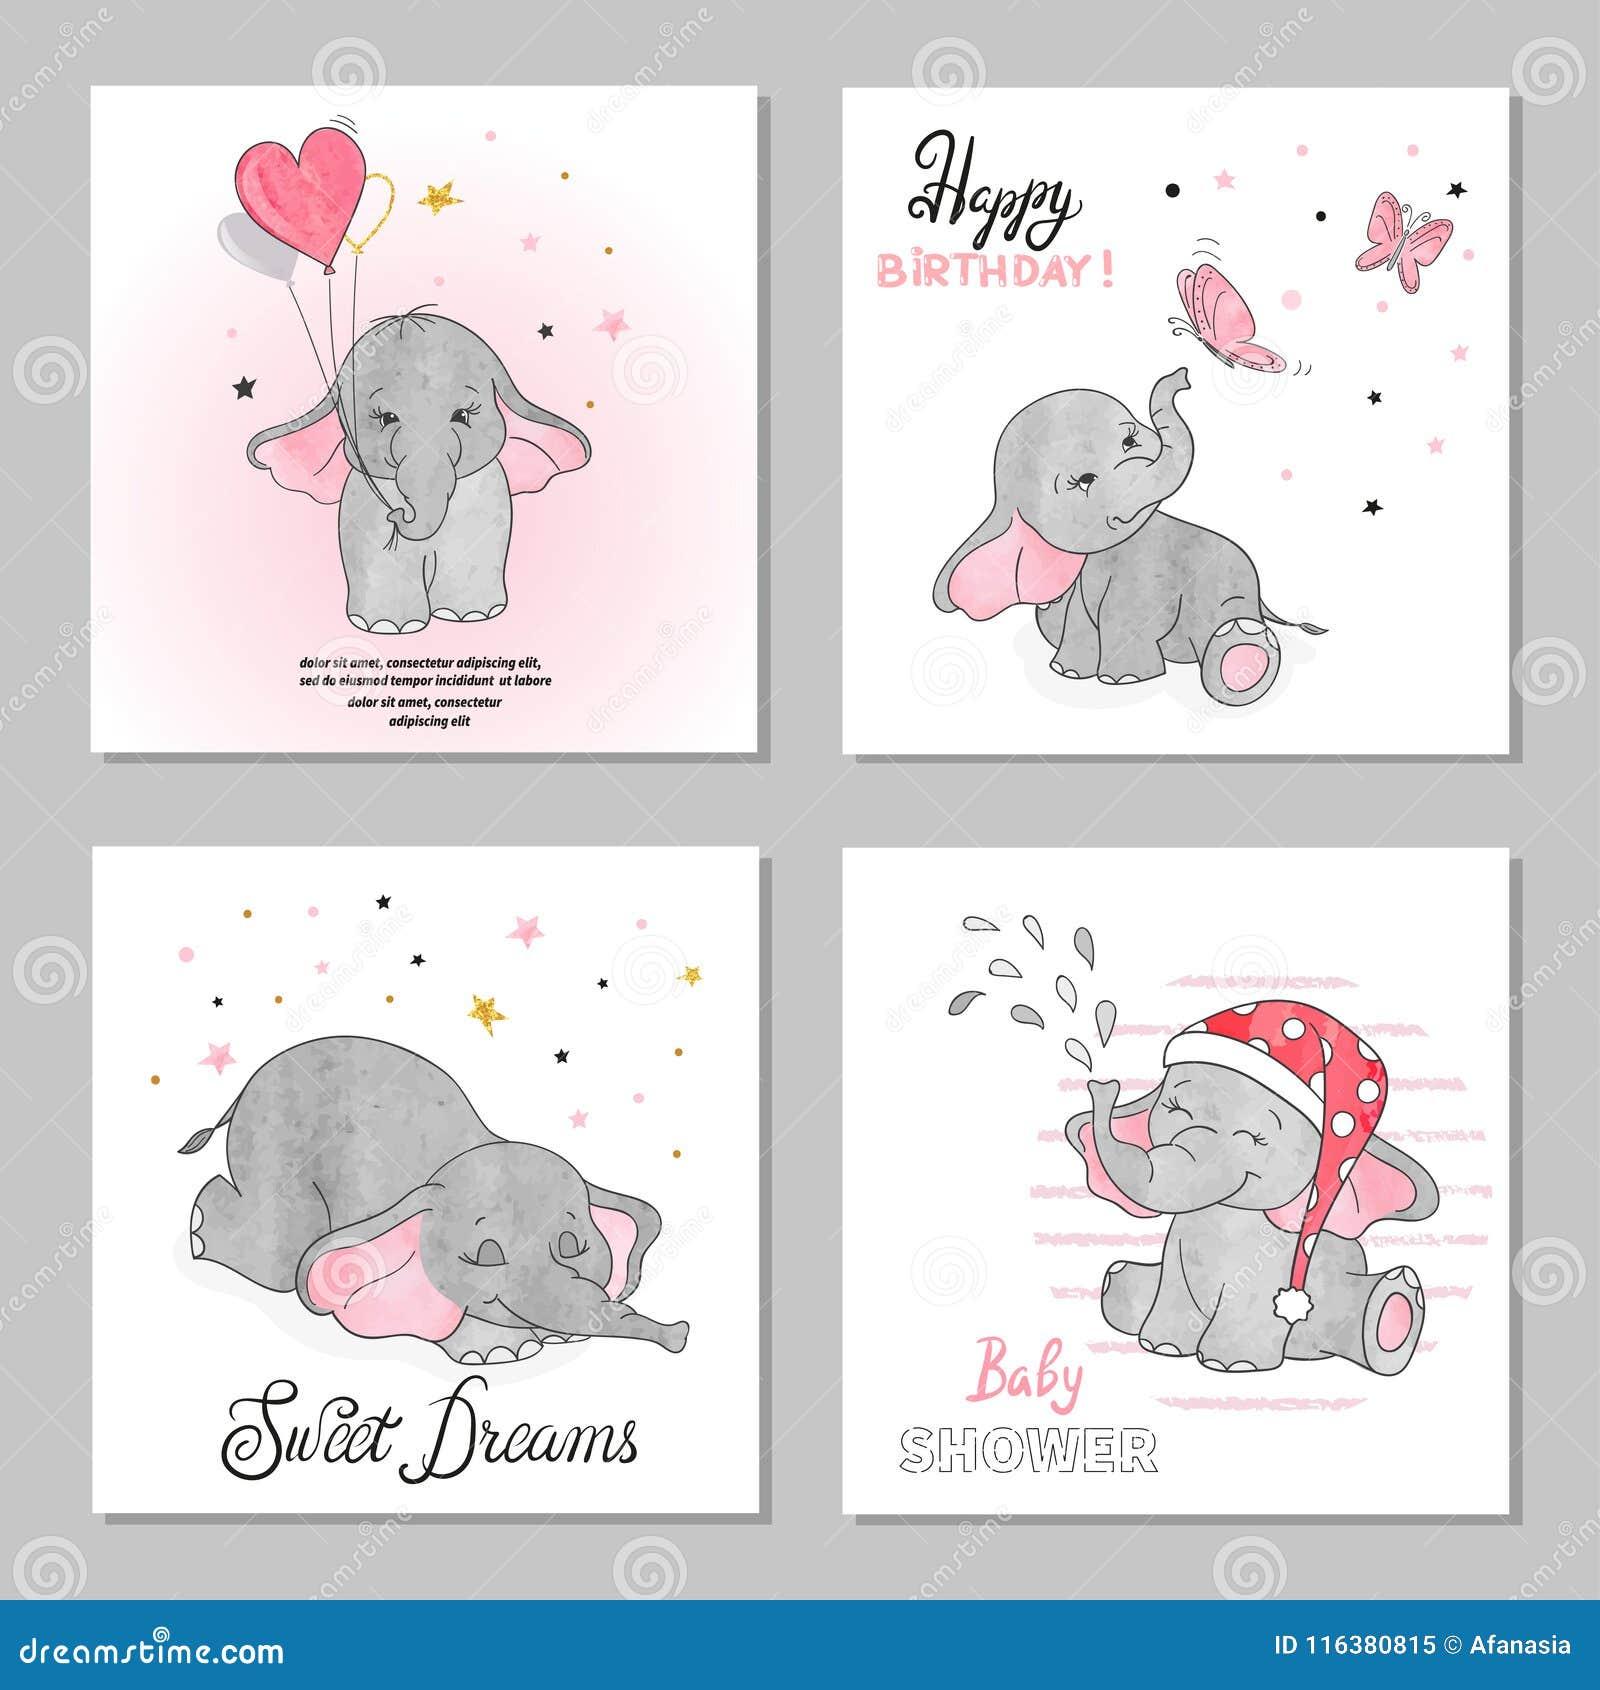 Cute Elephants Vector Illustrations Set Of Birthday Greeting Cards